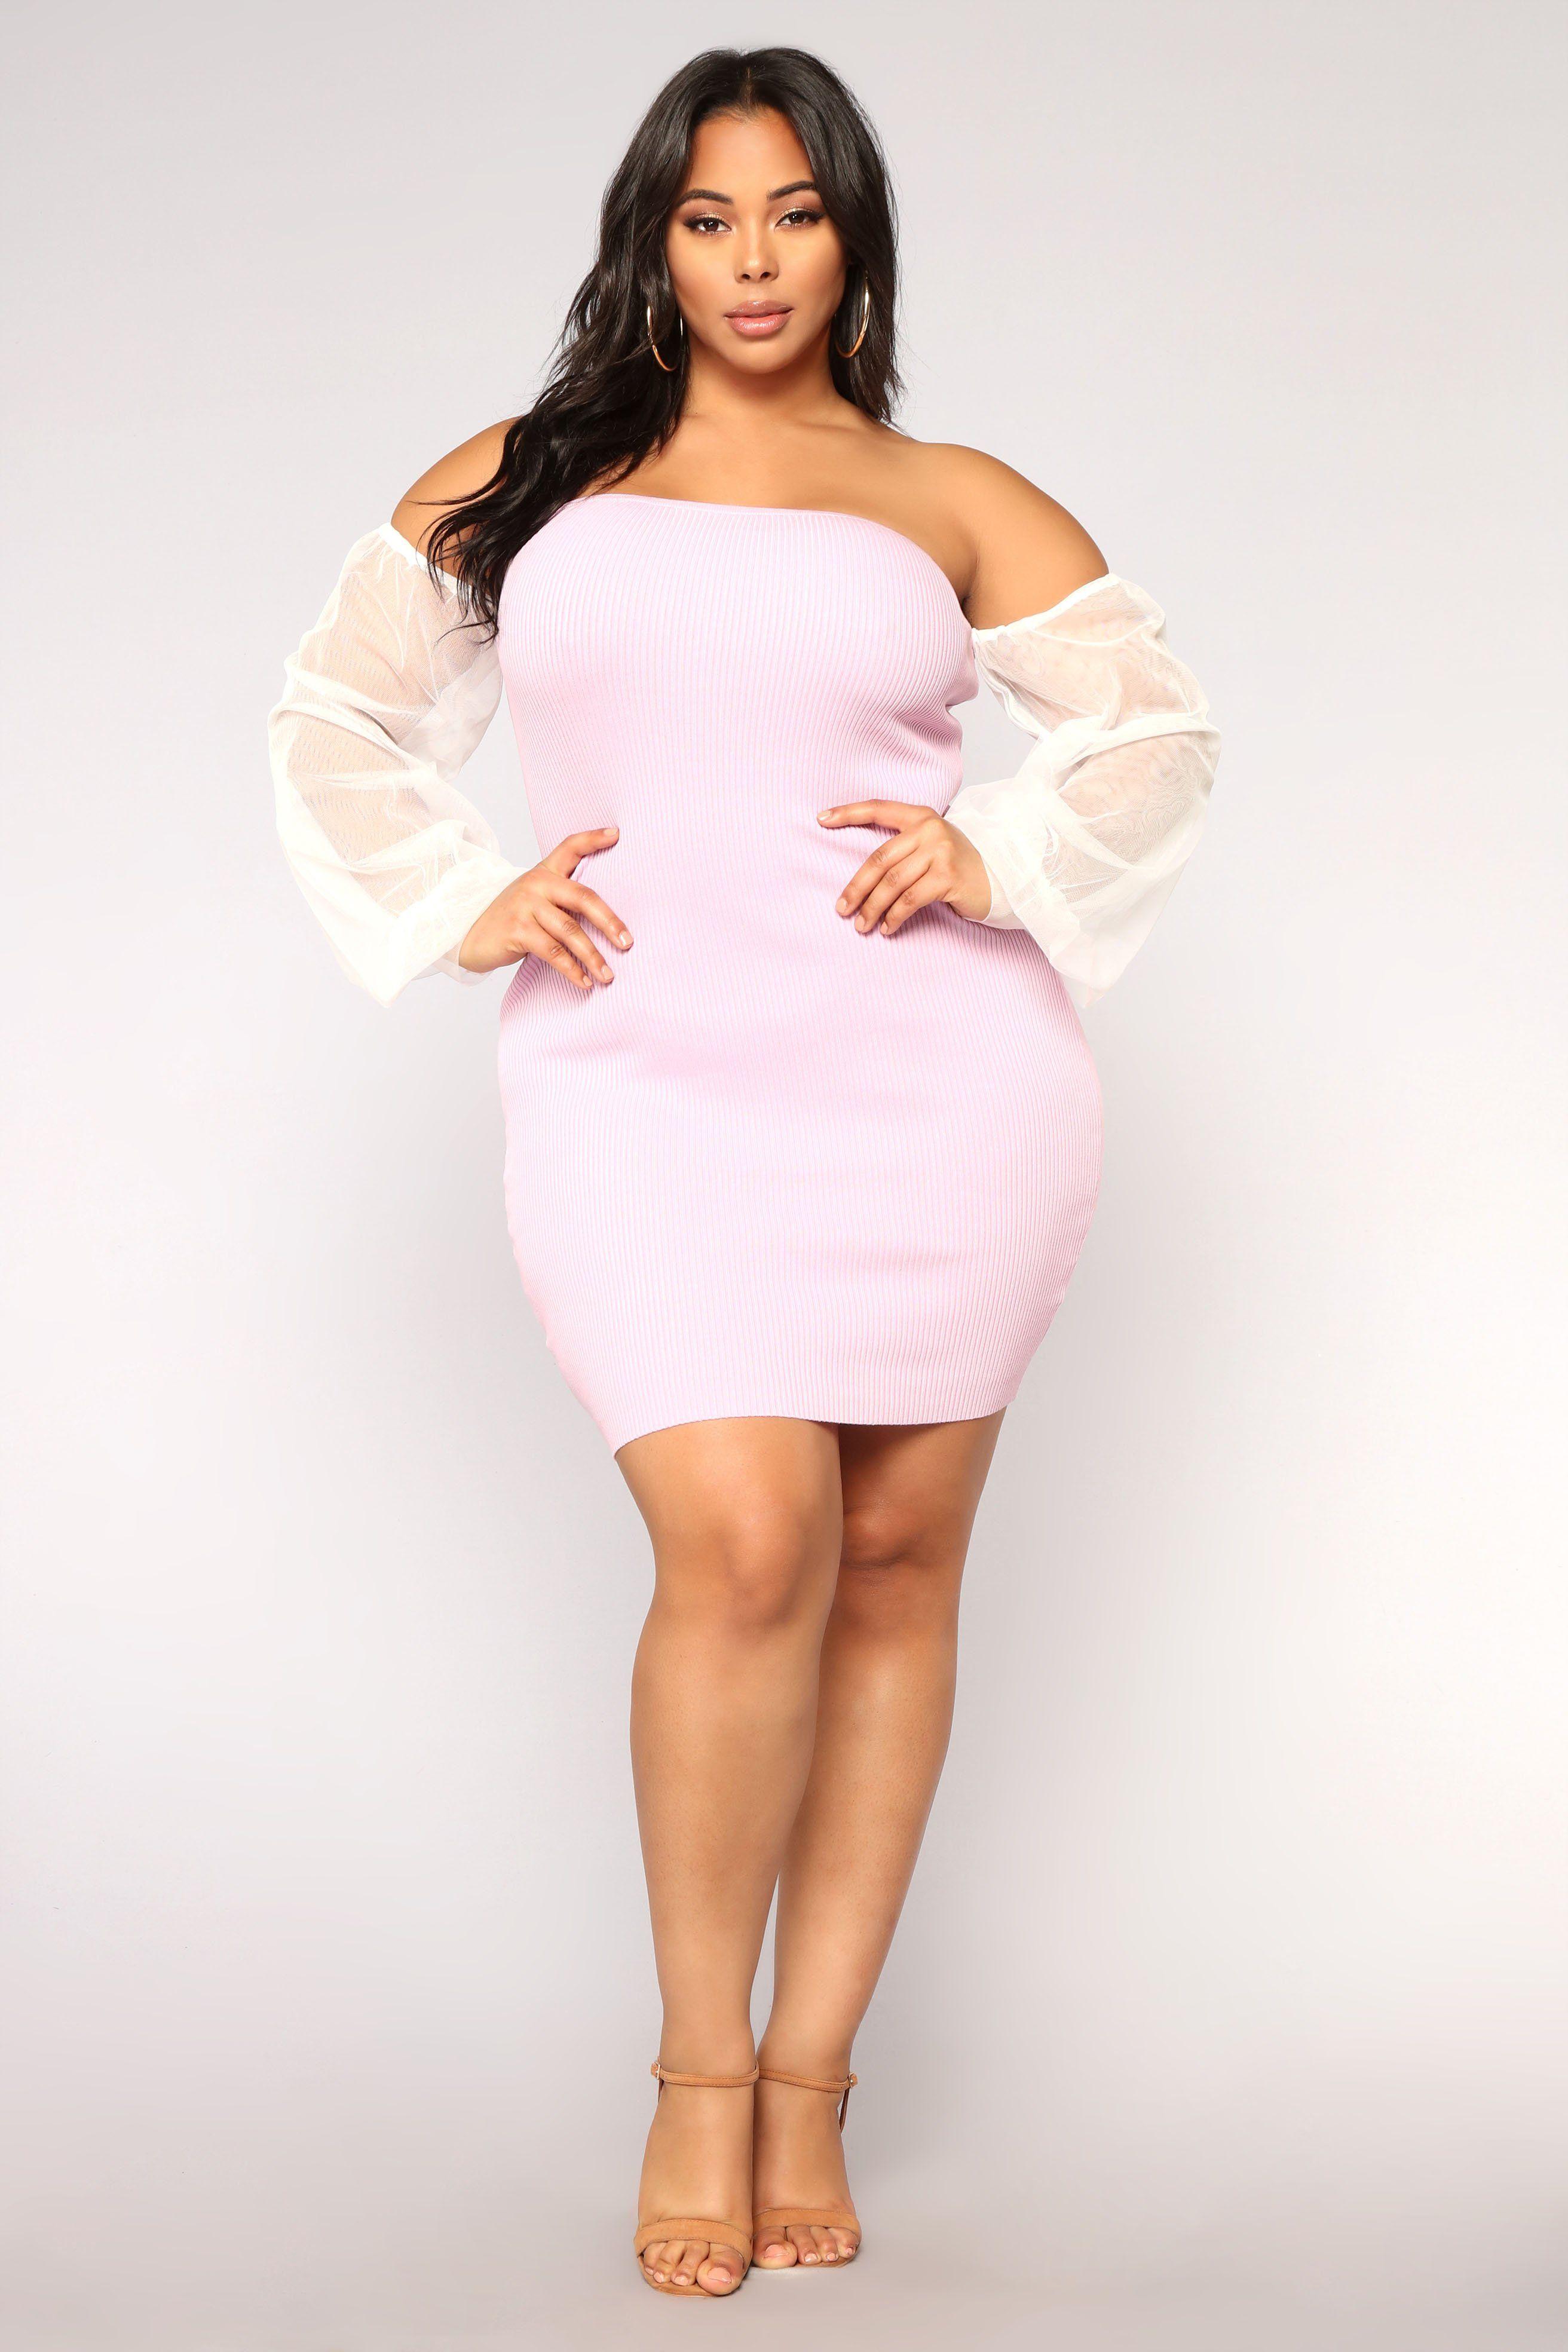 Purple Dress Www Fashionnova Com Fashion Curvy Fashion Summer Dresses For Women [ 3936 x 2624 Pixel ]